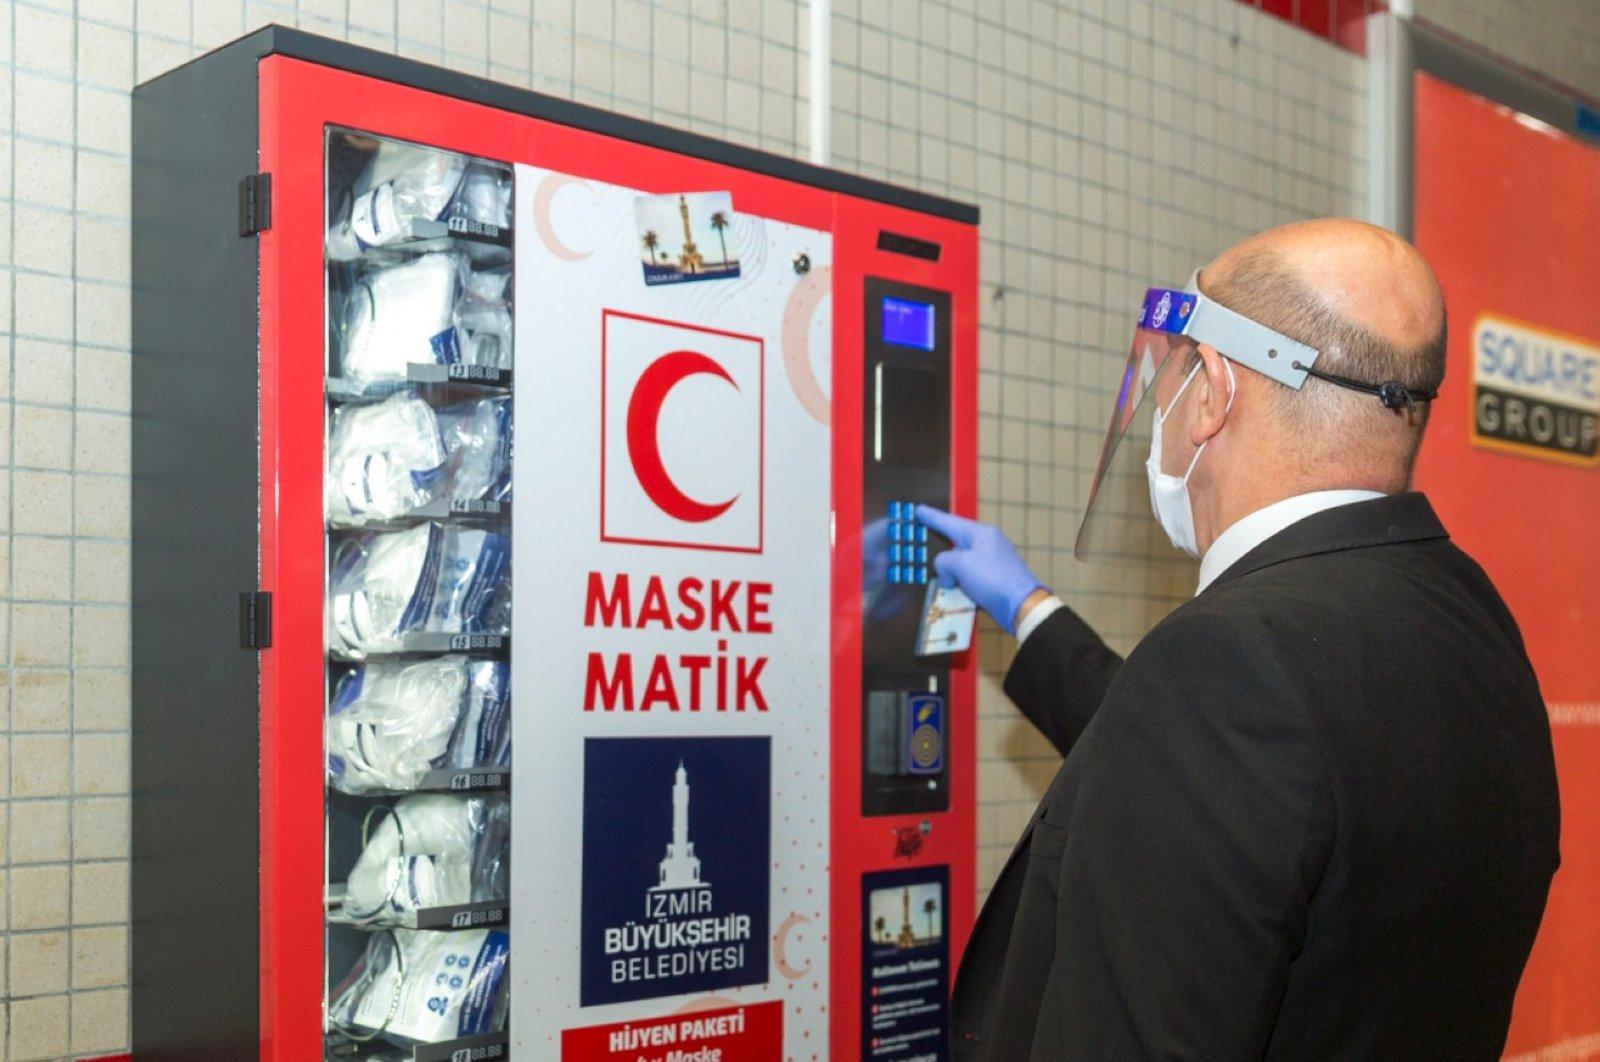 A man uses a mask vending machine in Konak metro station, İzmir, Turkey, April 17, 2020. (AA Photo)